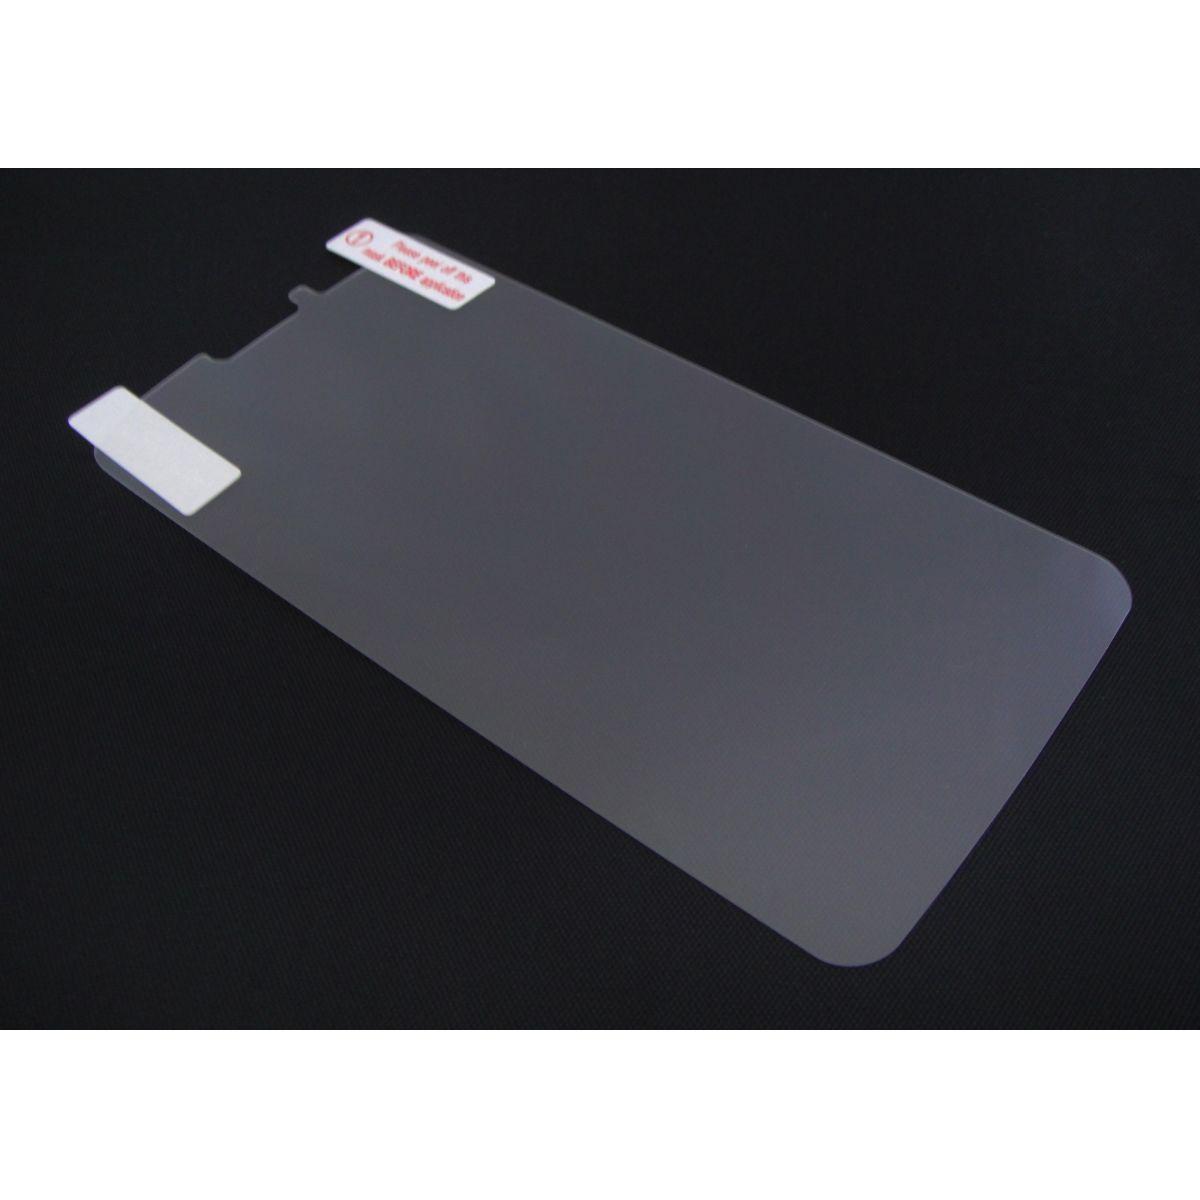 Película Protetora para LG G2 D801 - Fosca